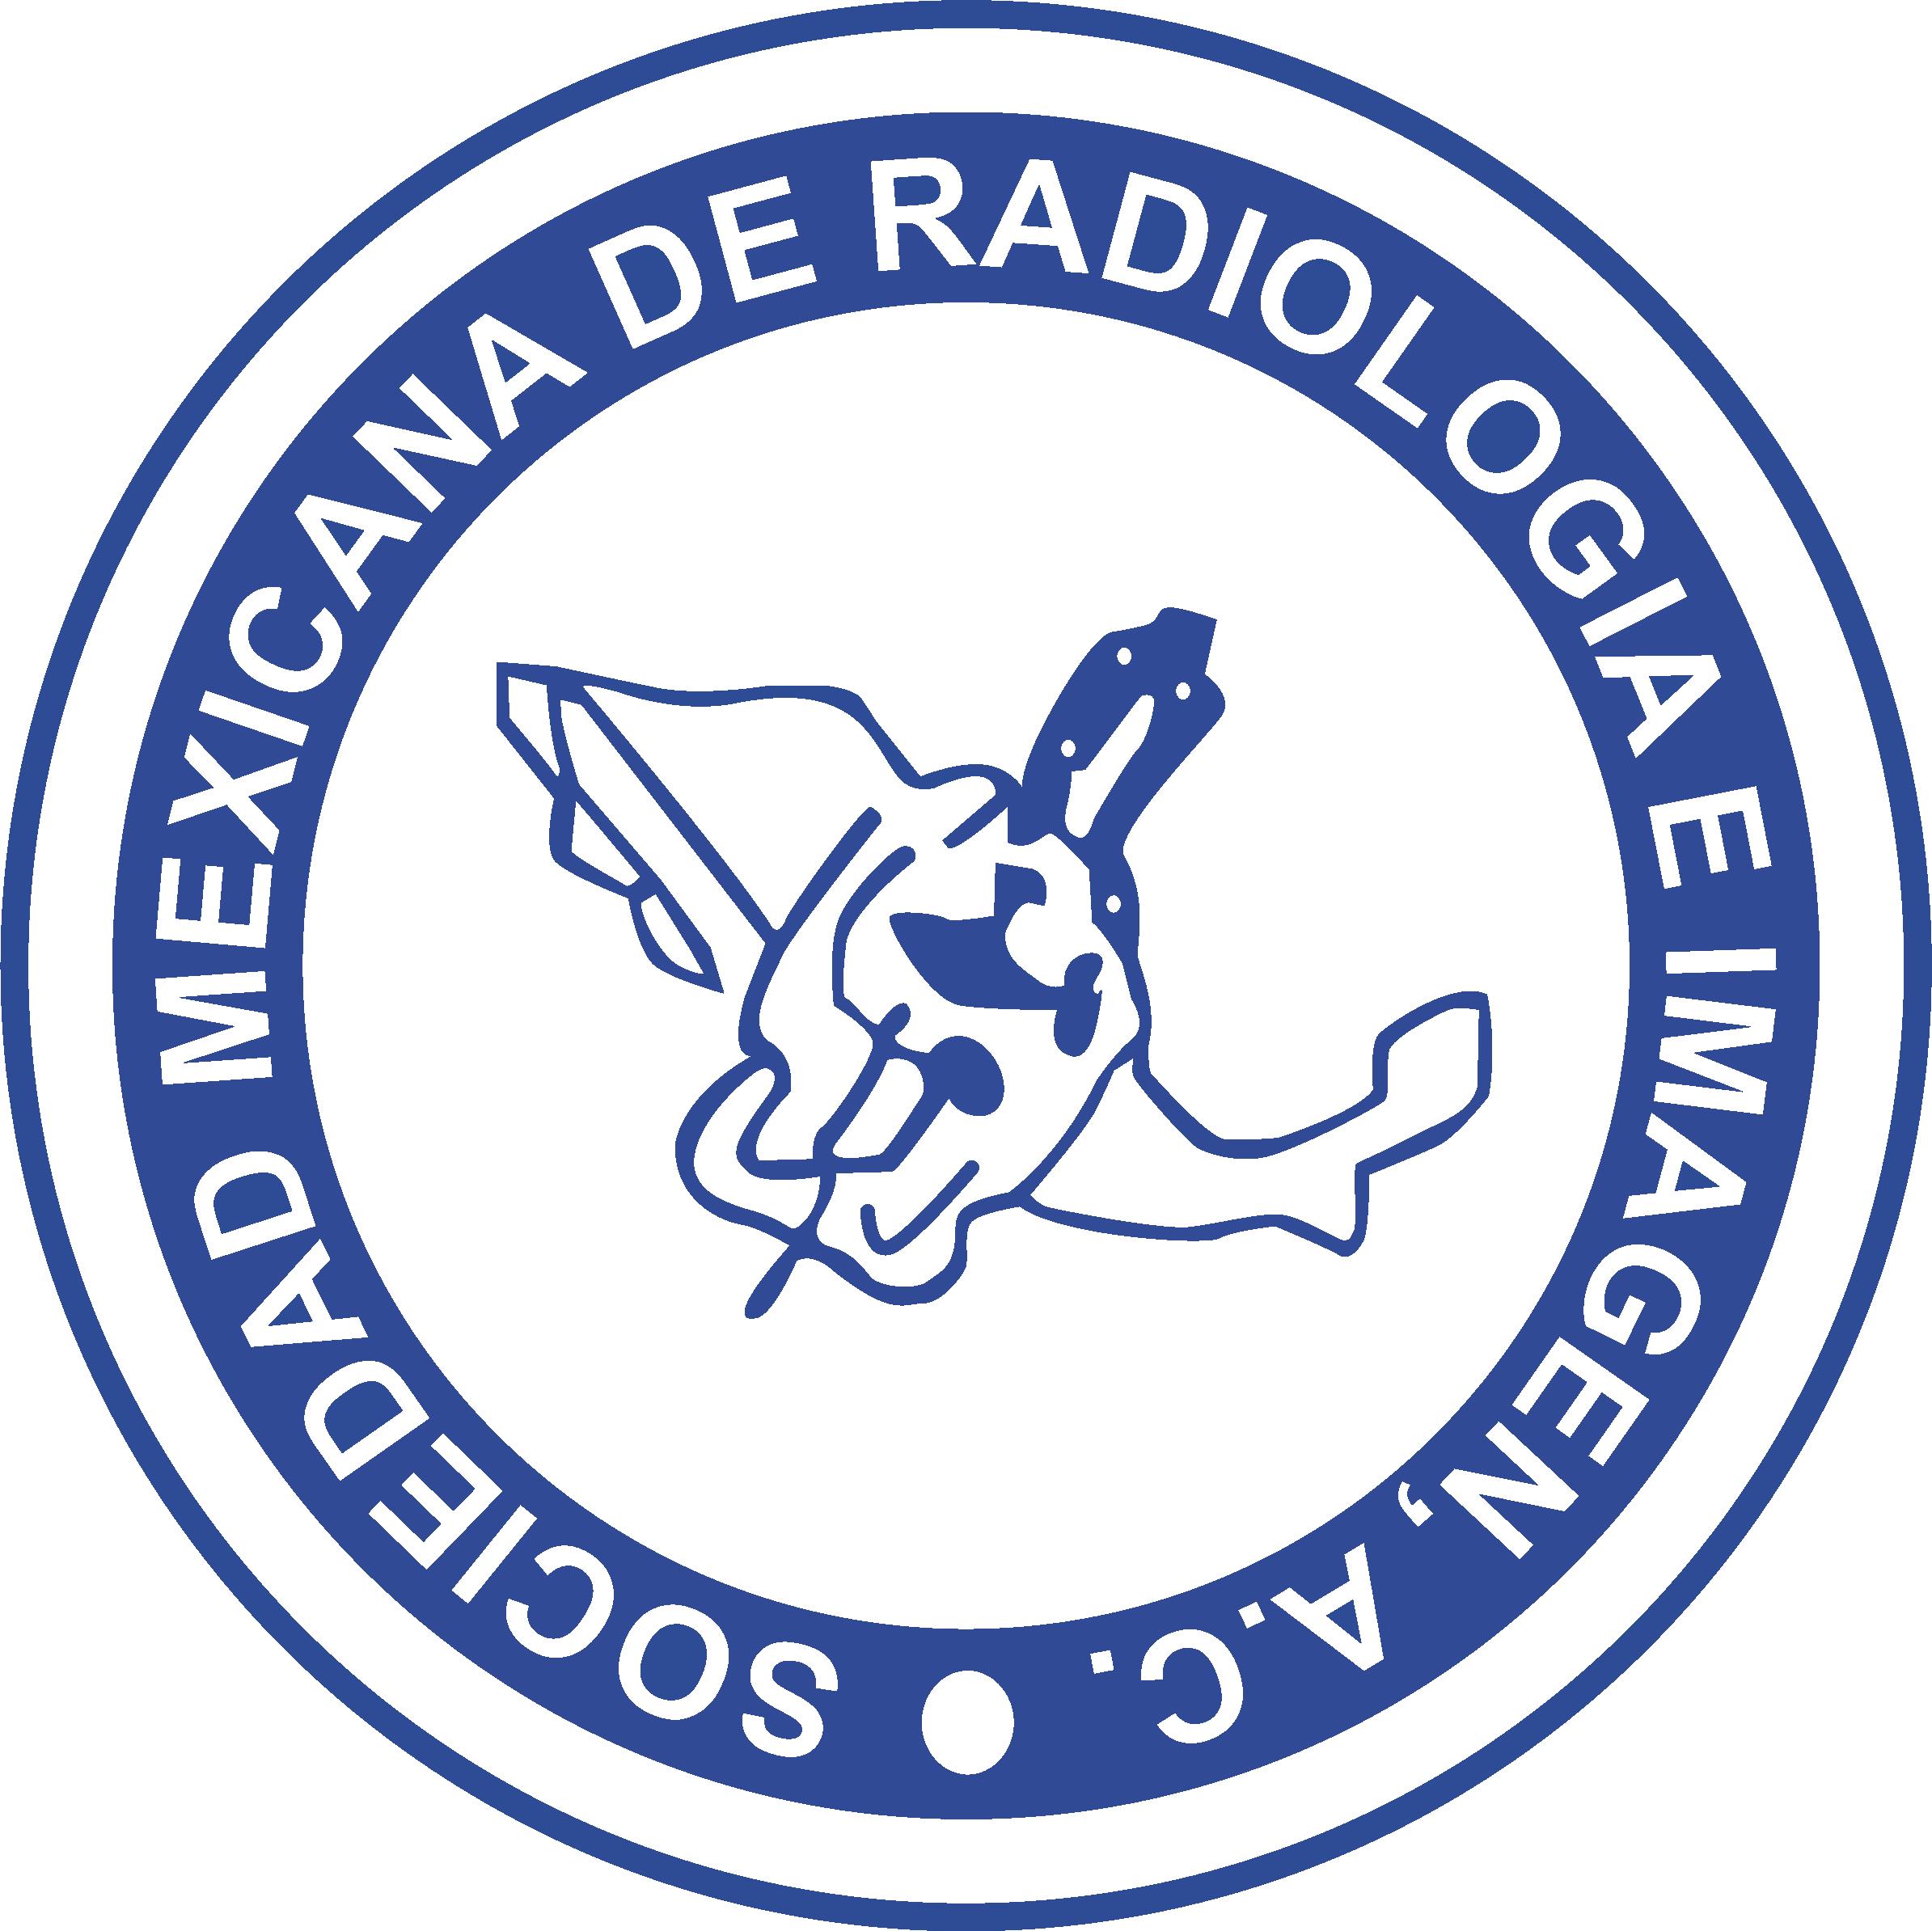 Mexican Federation of Radiology (FMRI)